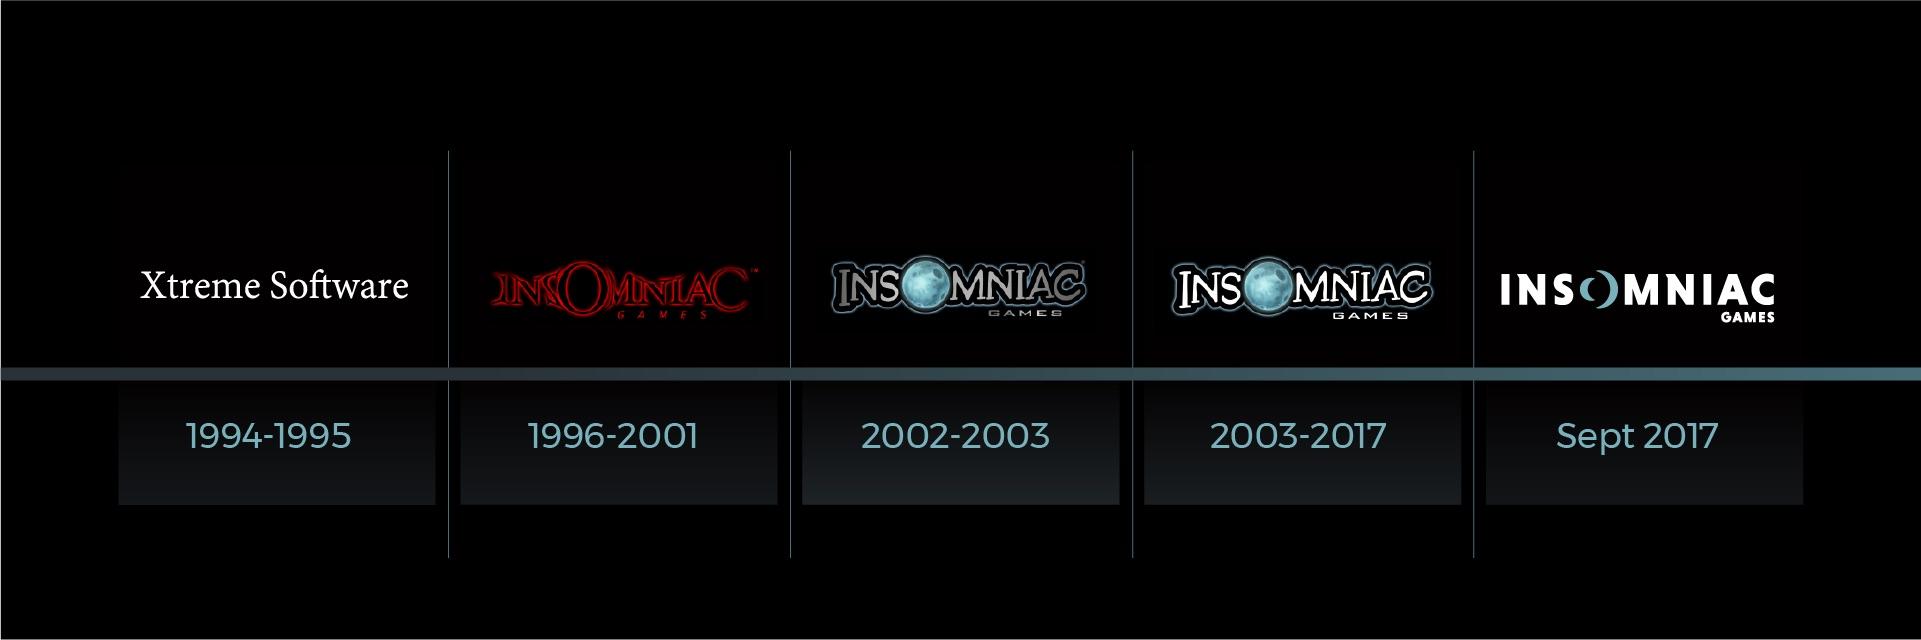 insomniac games logo evolution